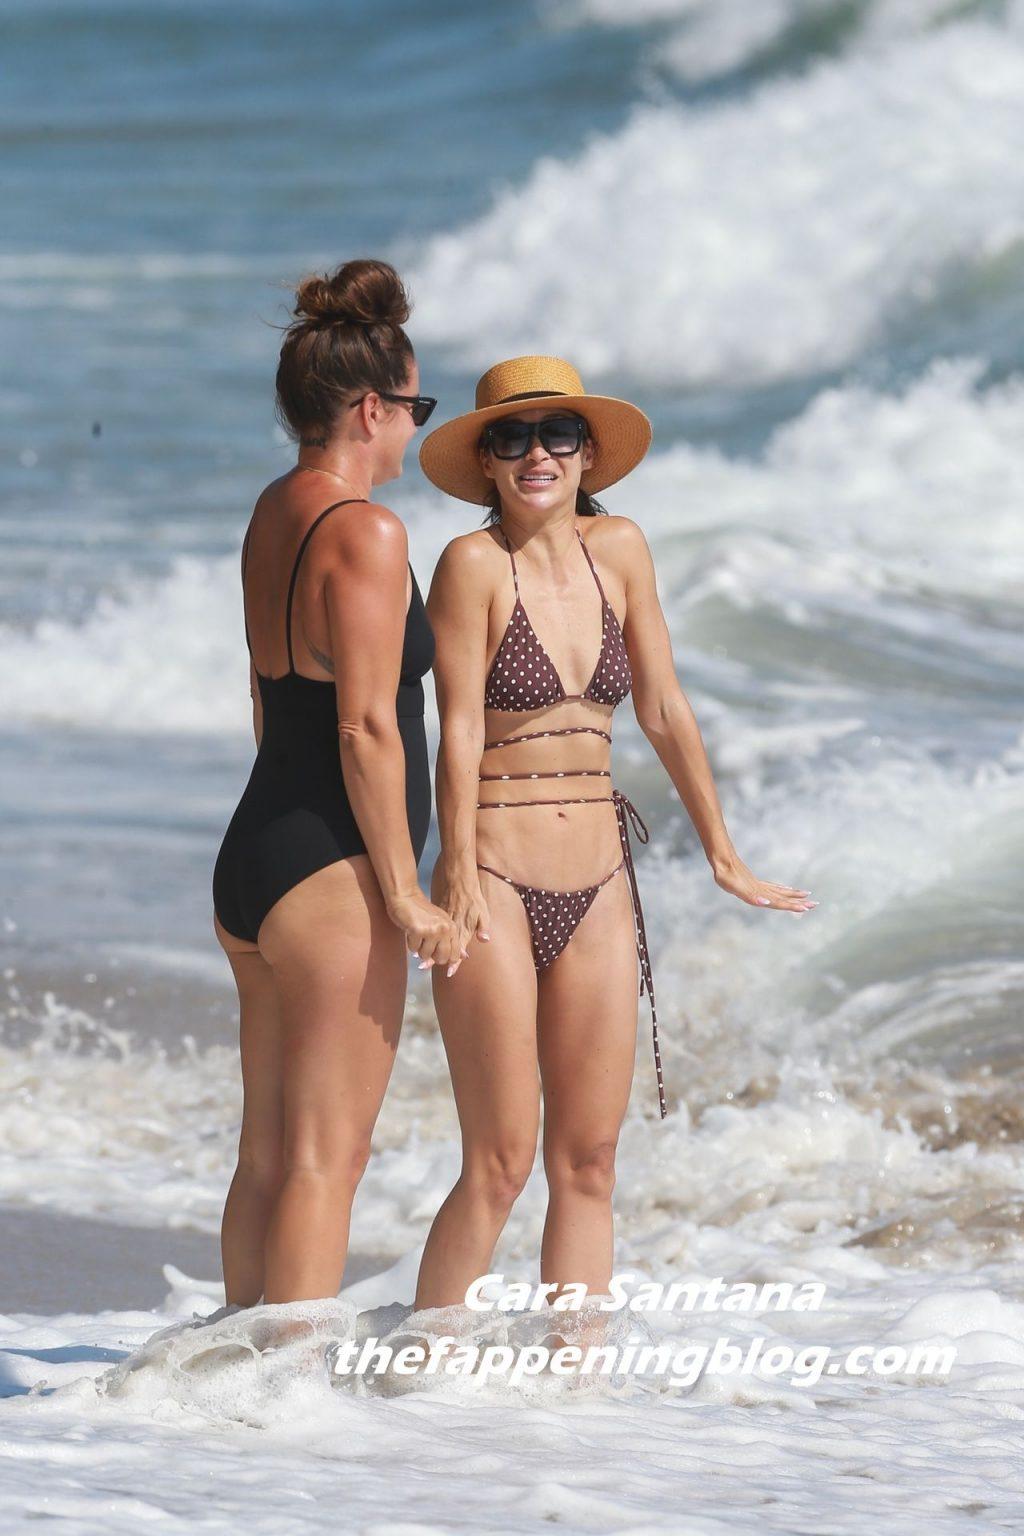 Cara Santana Enjoys a Day at the Beach with Friends in Malibu (98 Photos)